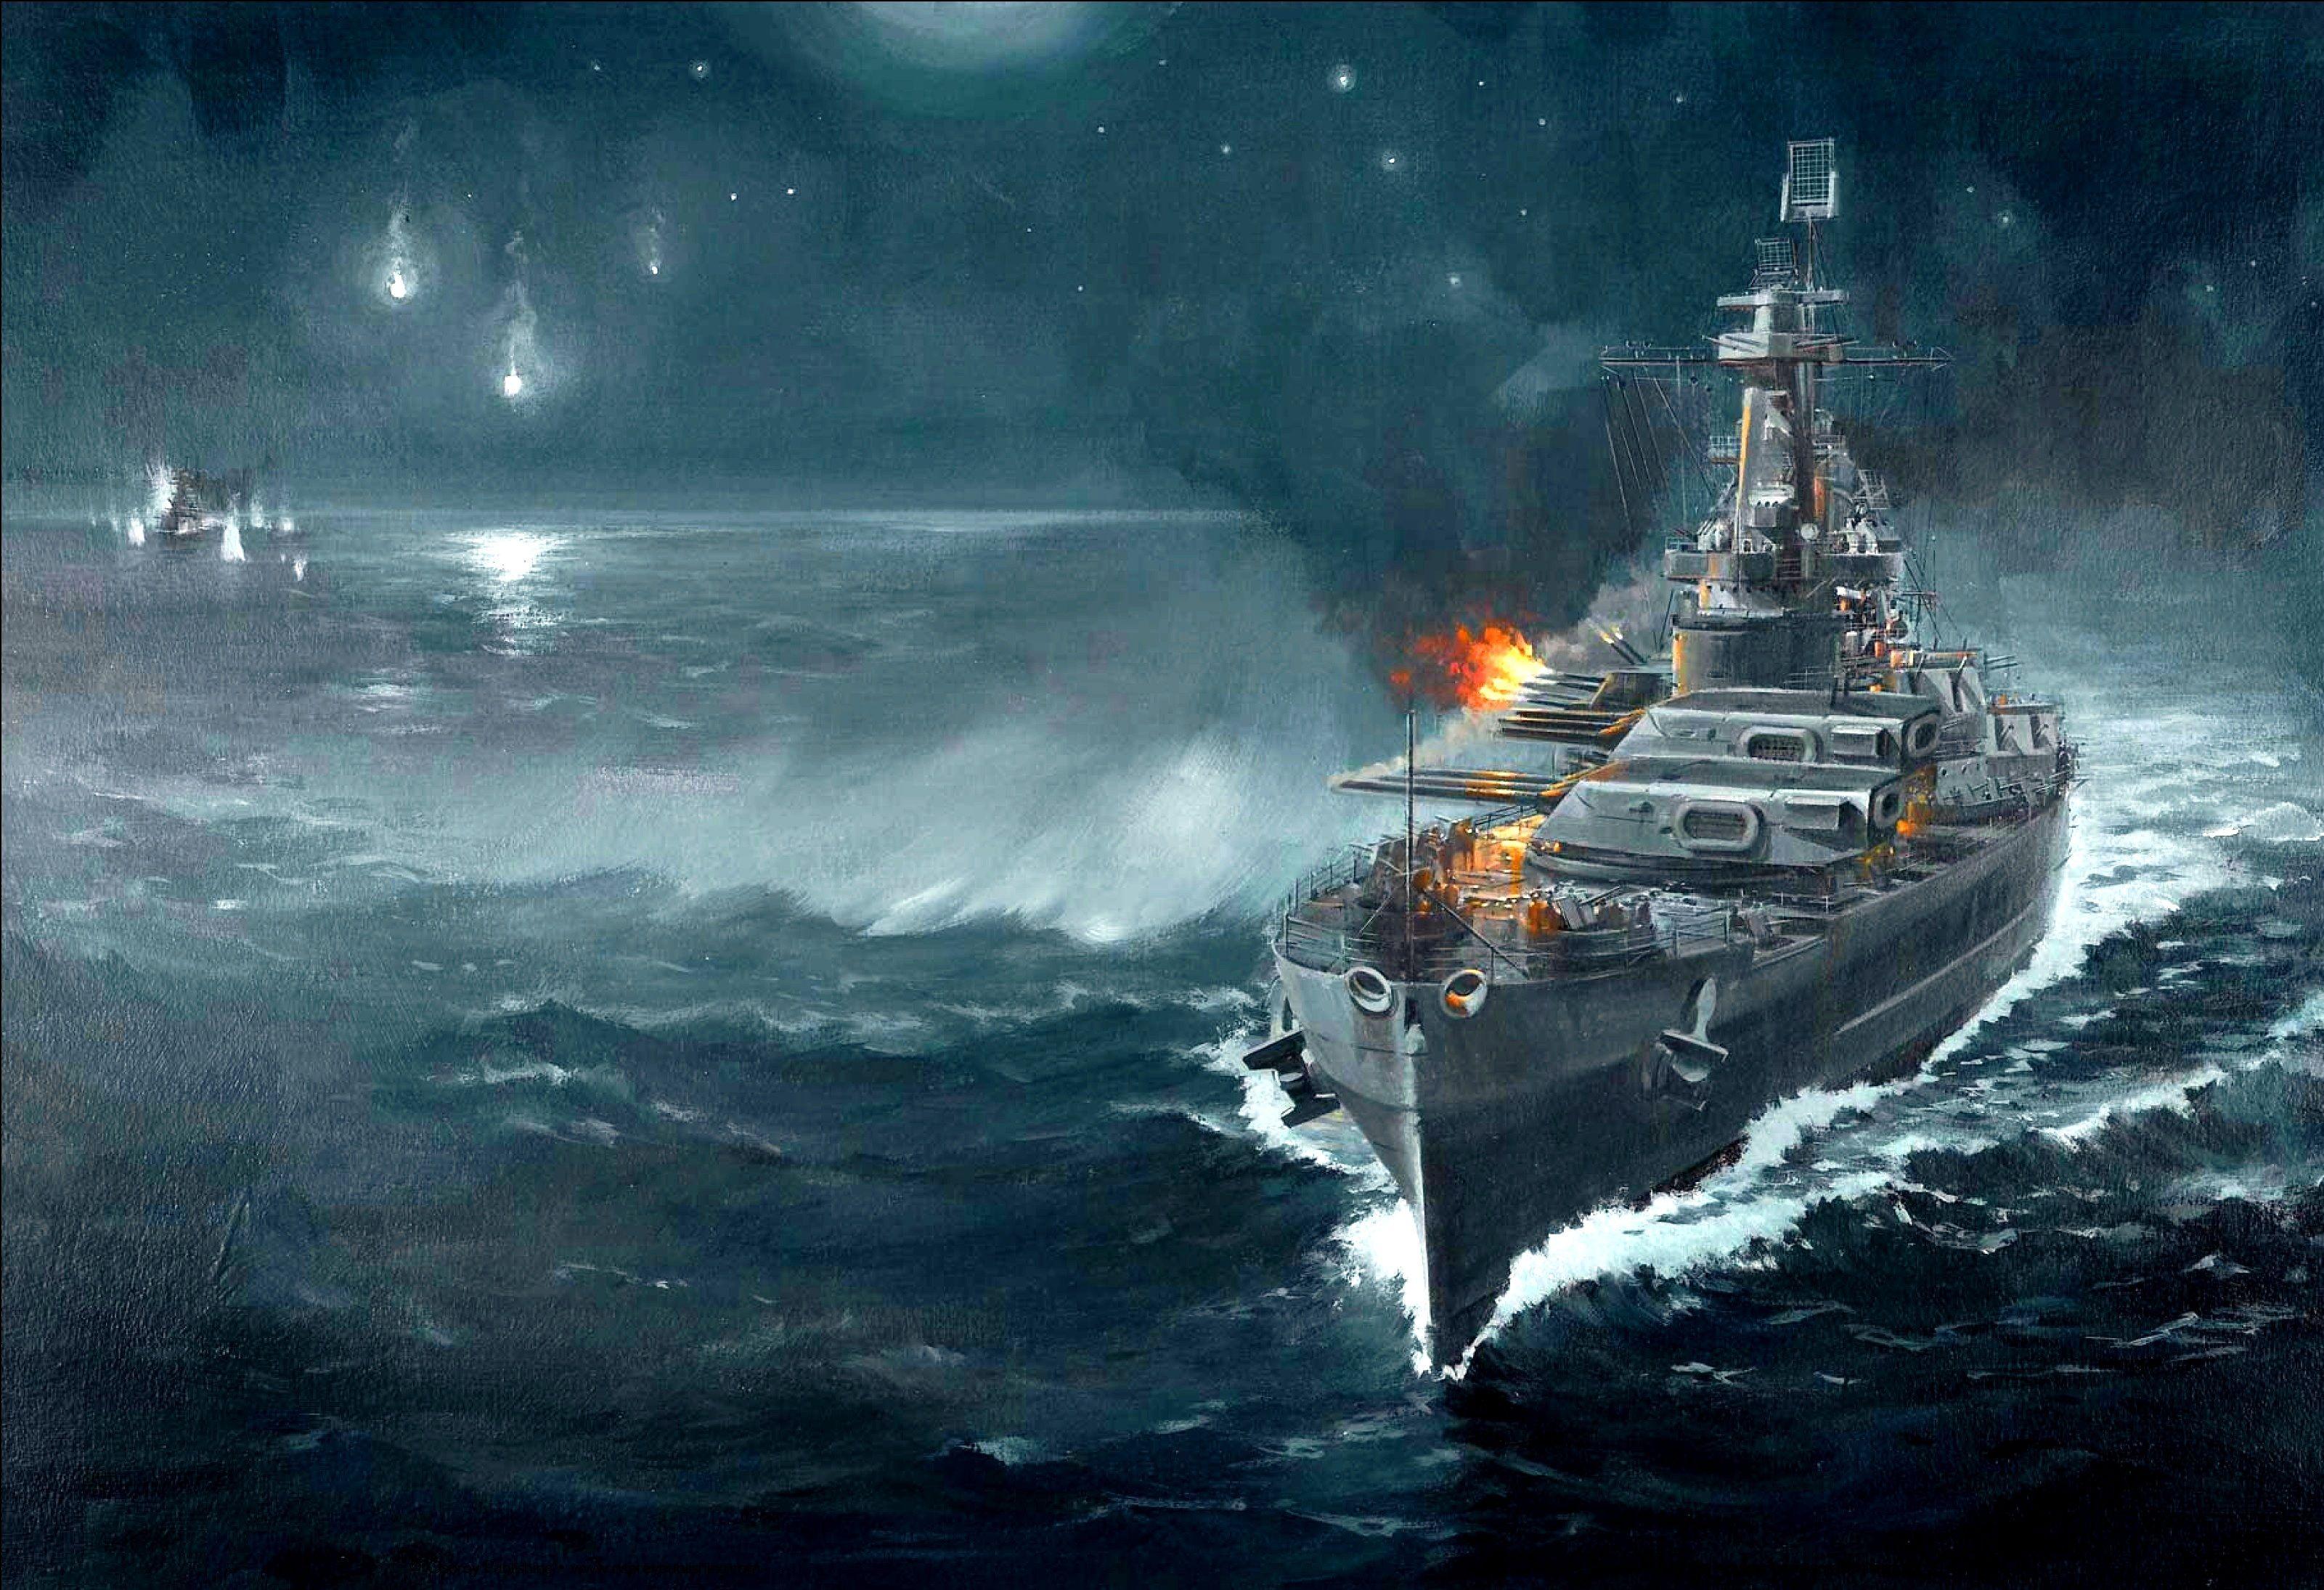 Military Painting Wwii Bing Obrazy World Of Warships Wallpaper Battleship Warship